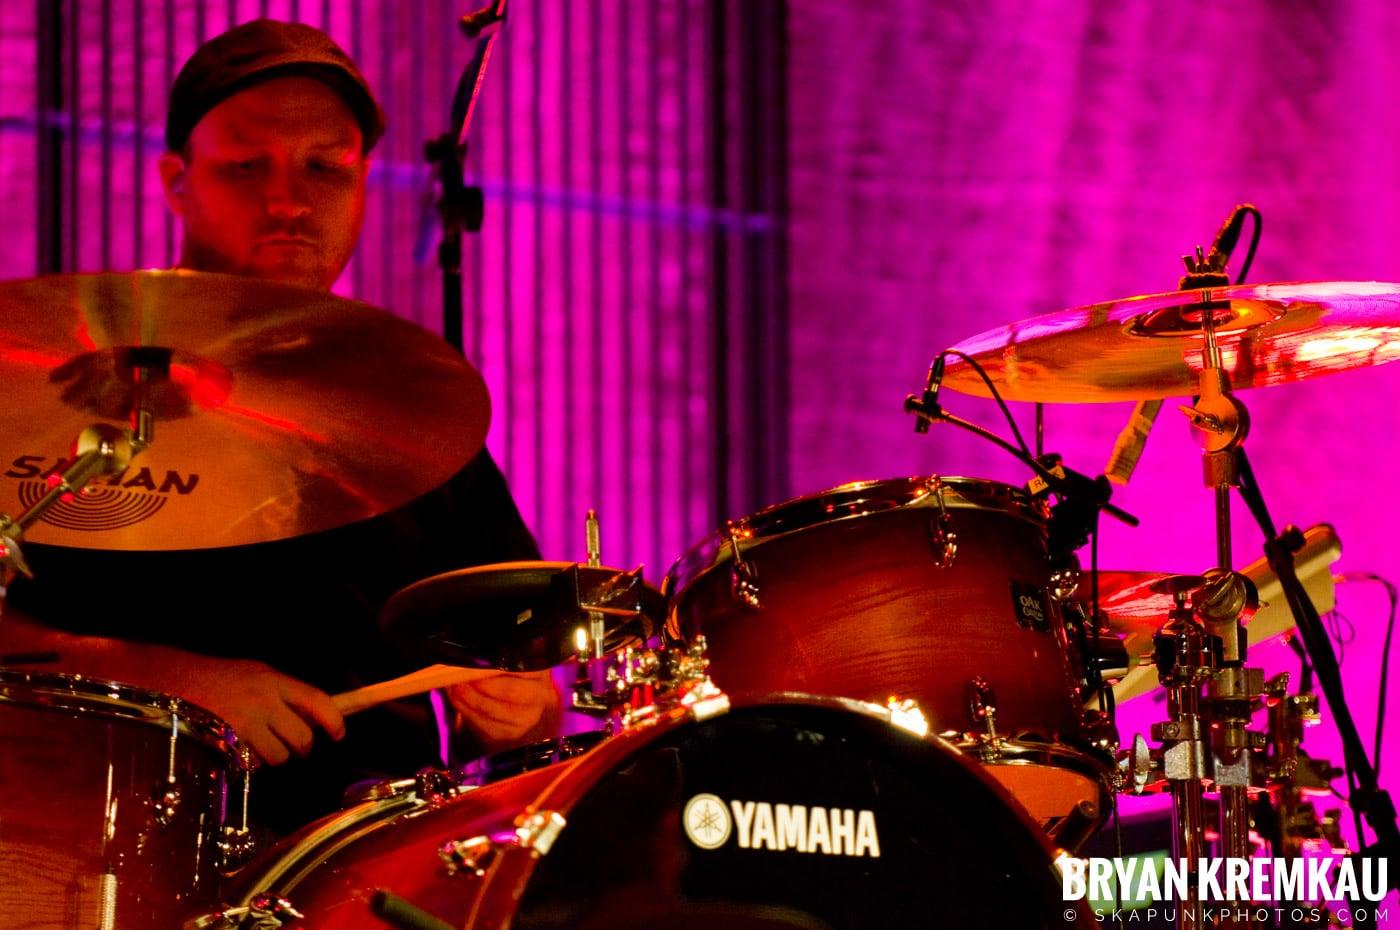 Great Big Sea @ Tarrytown Music Hall, Tarrytown, NY - 10.10.09 (17)